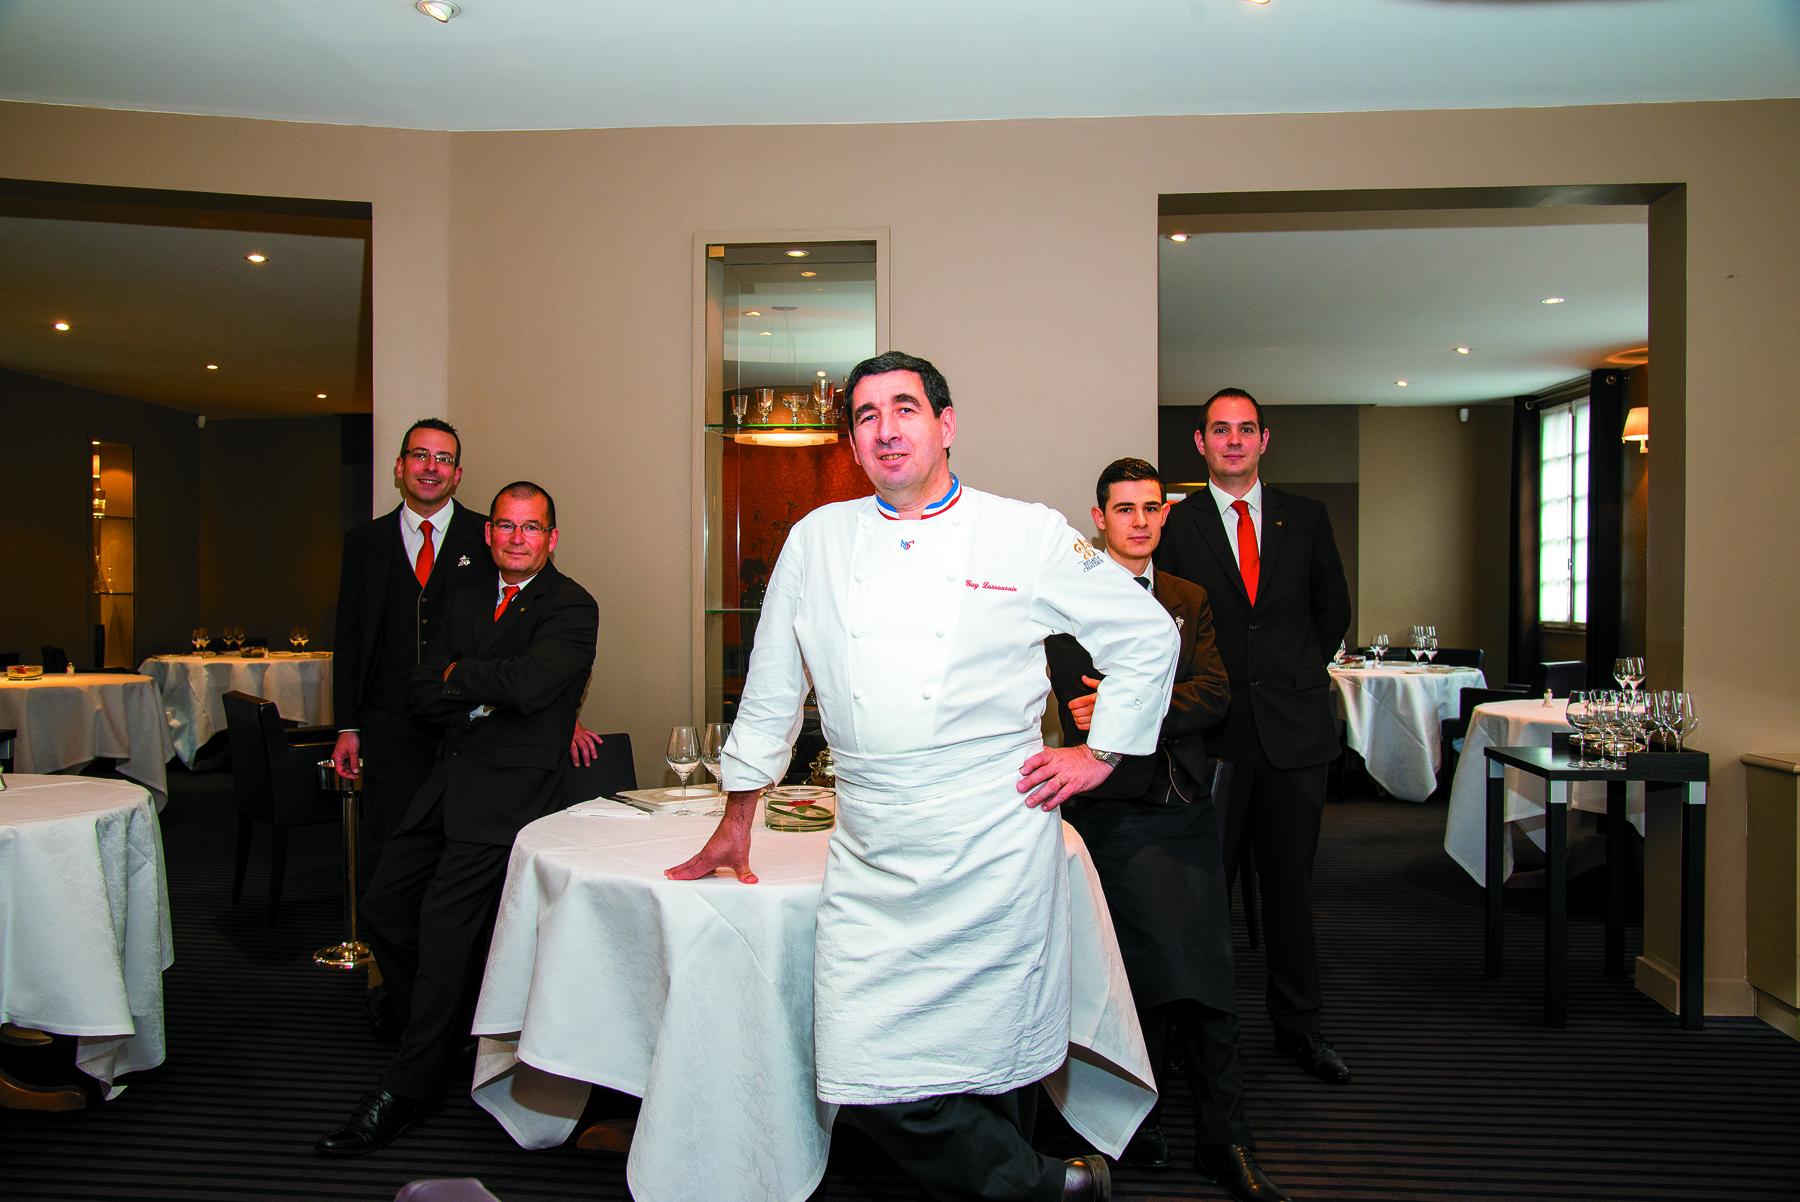 Restaurant Guy Lassausaie - Guy Lassausaie